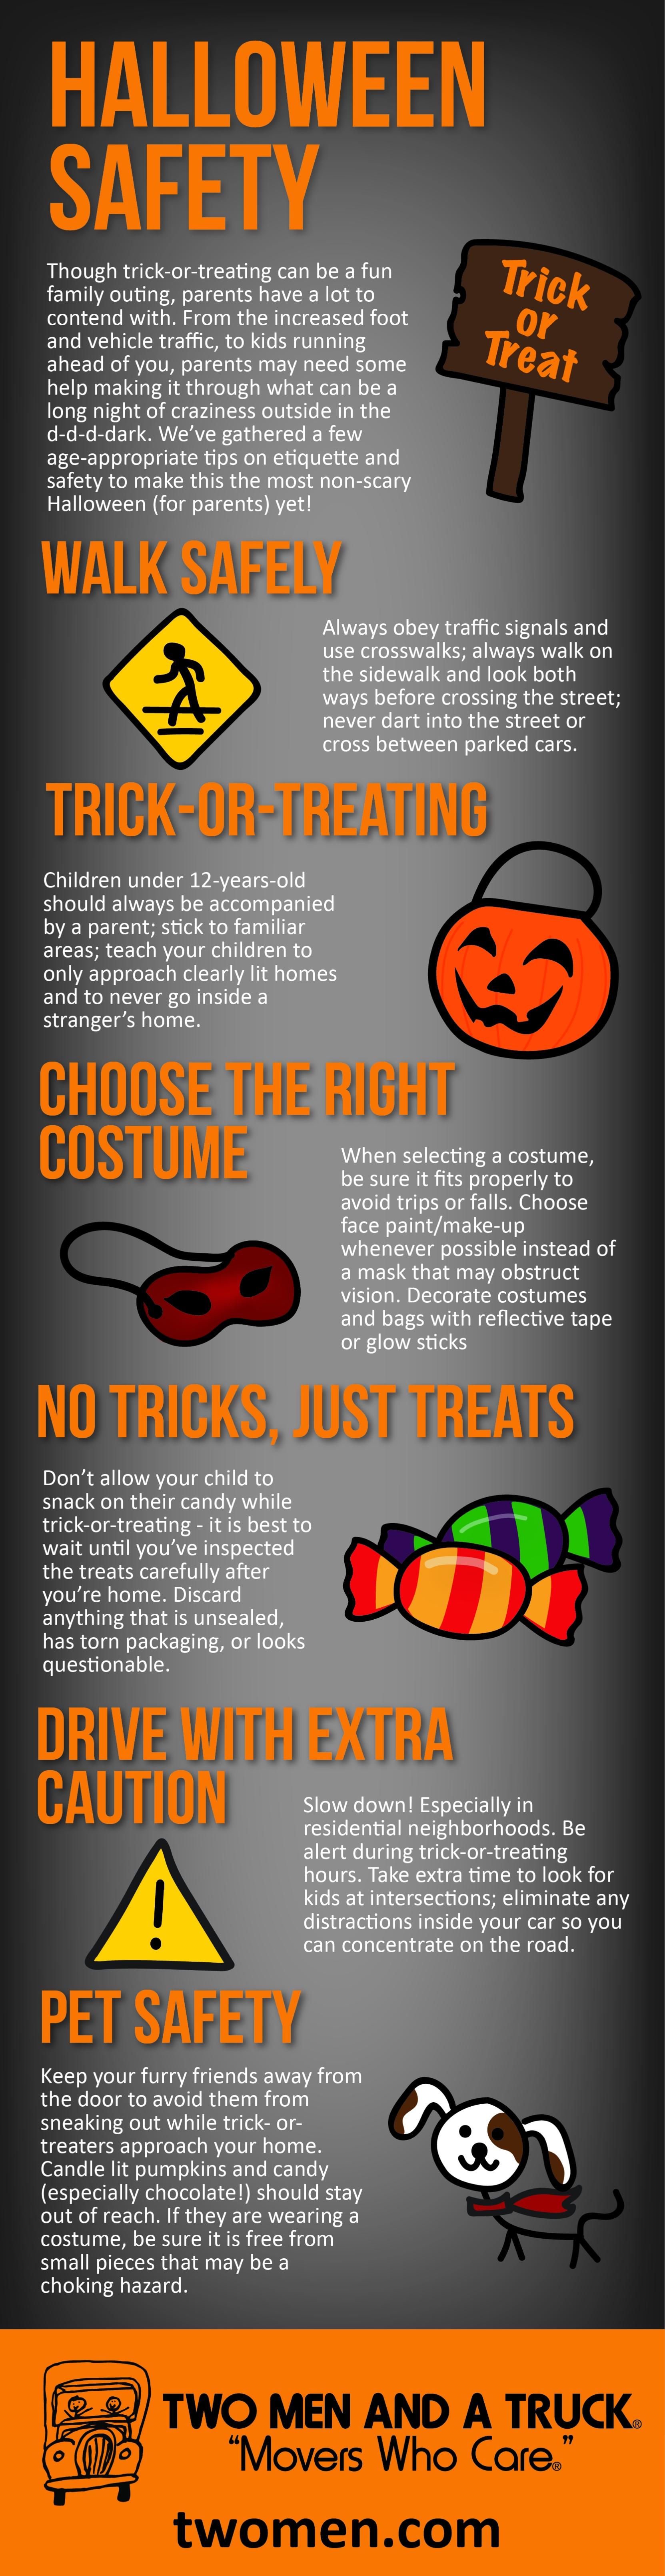 Halloween saftey infographic-01